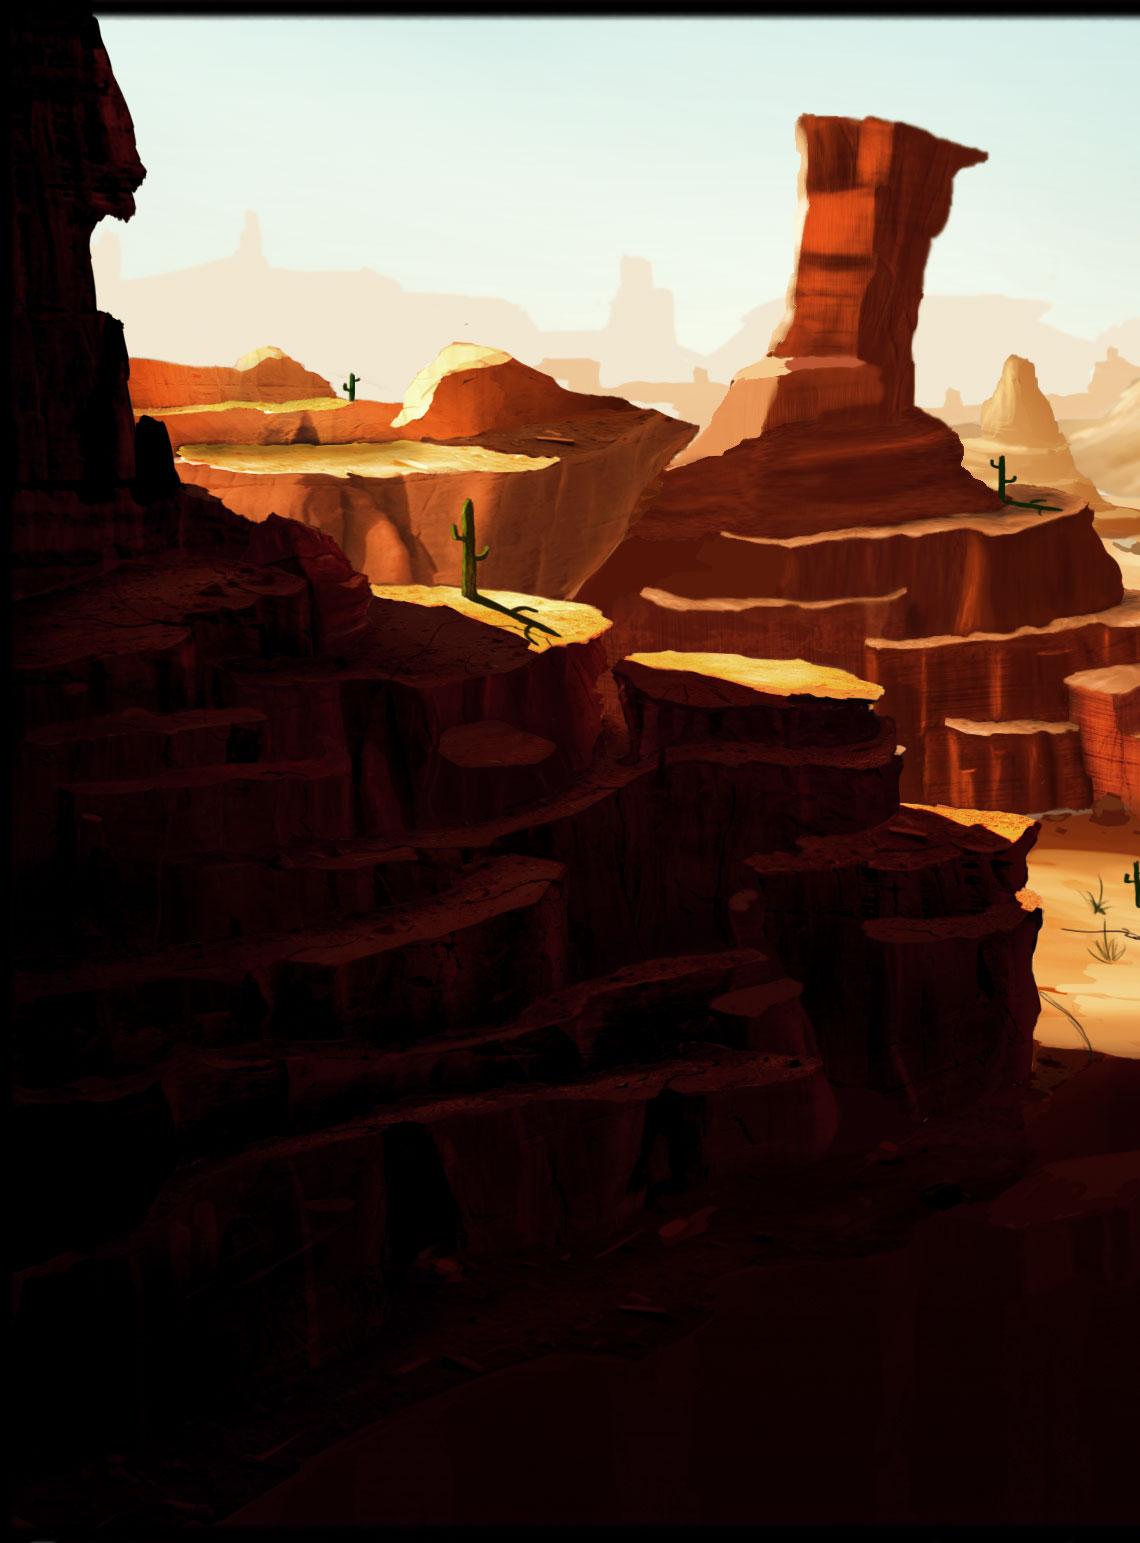 canyon-300dpiv19-big2.jpg